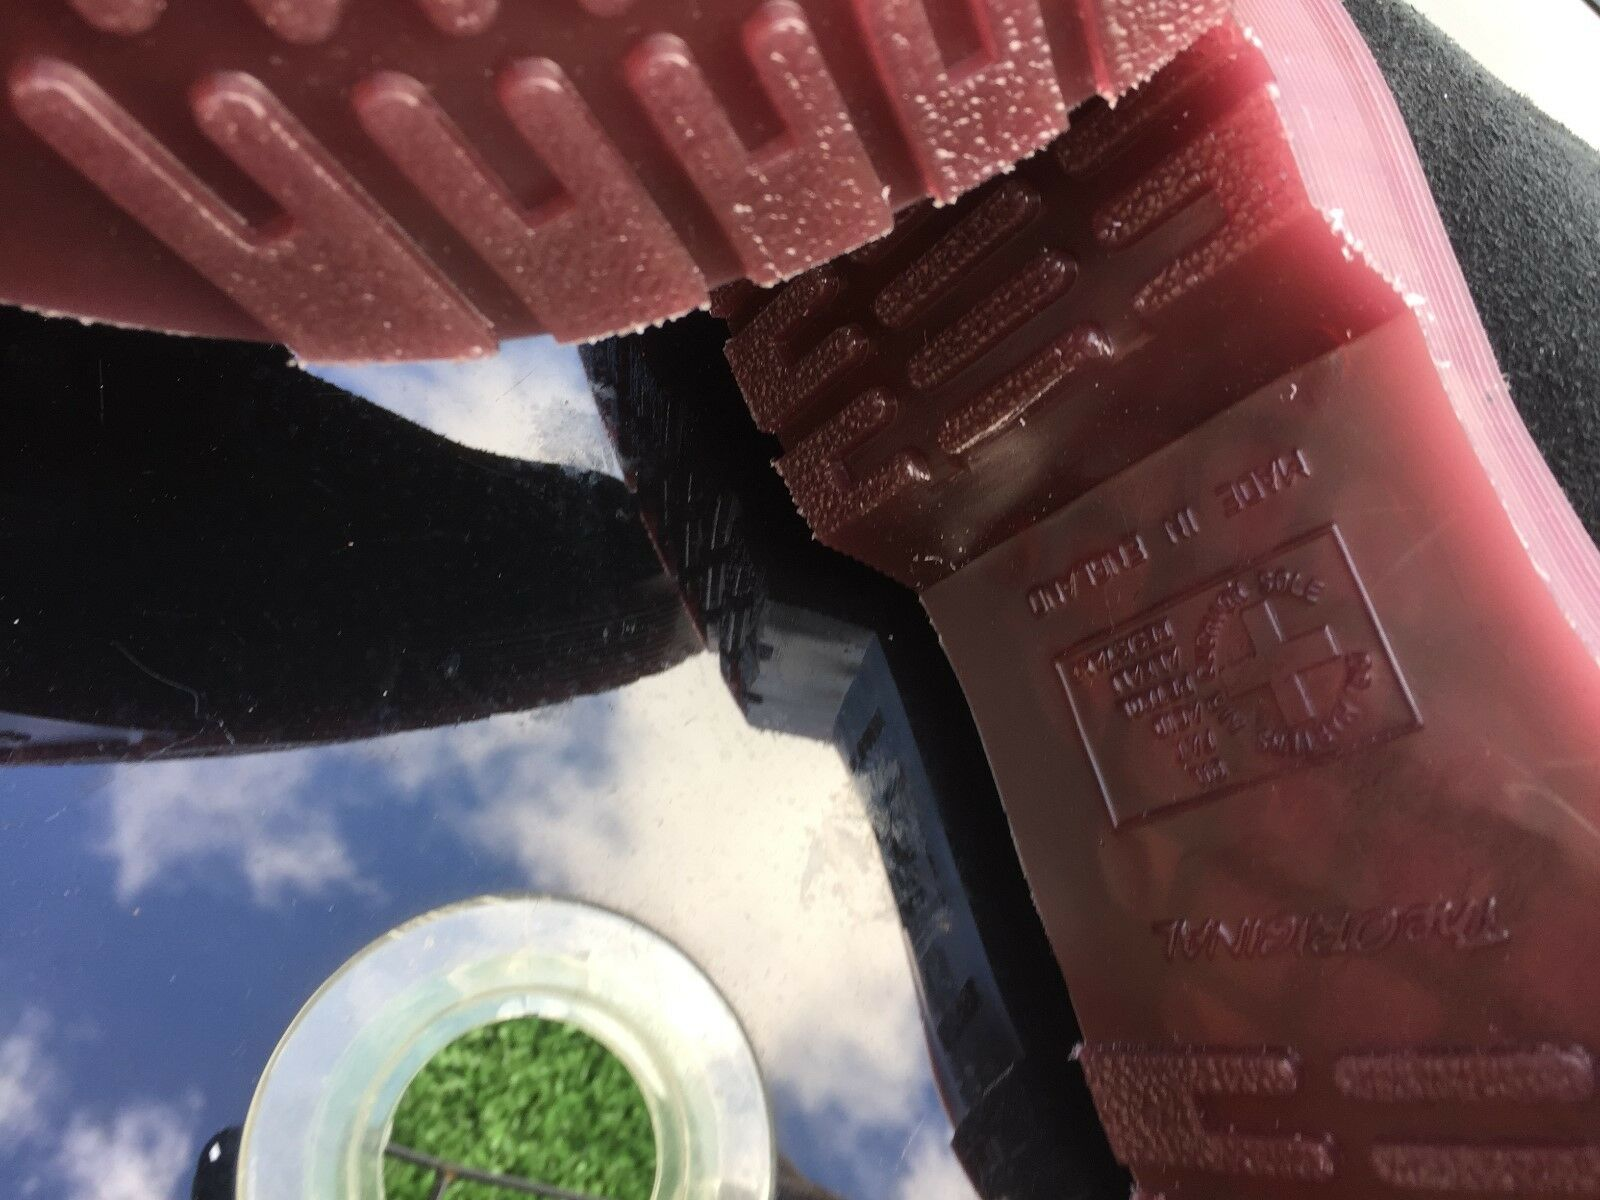 DR Martens 1461 1461 1461 neri in pelle scamosciata deserto Oasi in Pelle EU 39 Made in England 90f5db